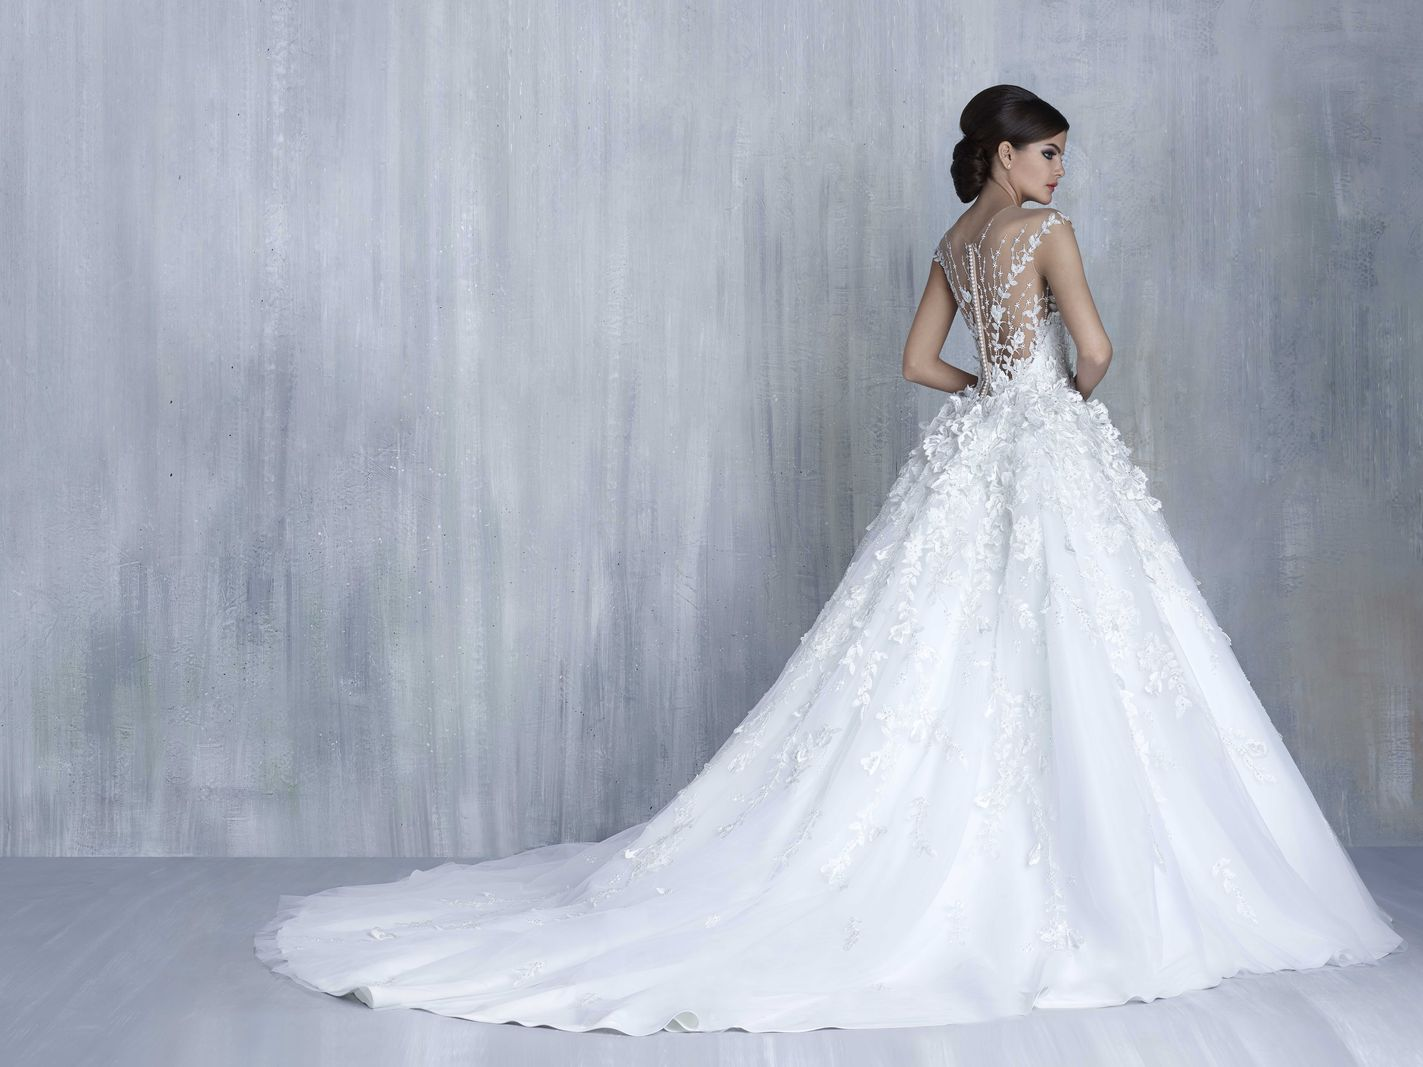 Wedding dresses I Bridal gowns I Beirut - Lebanon